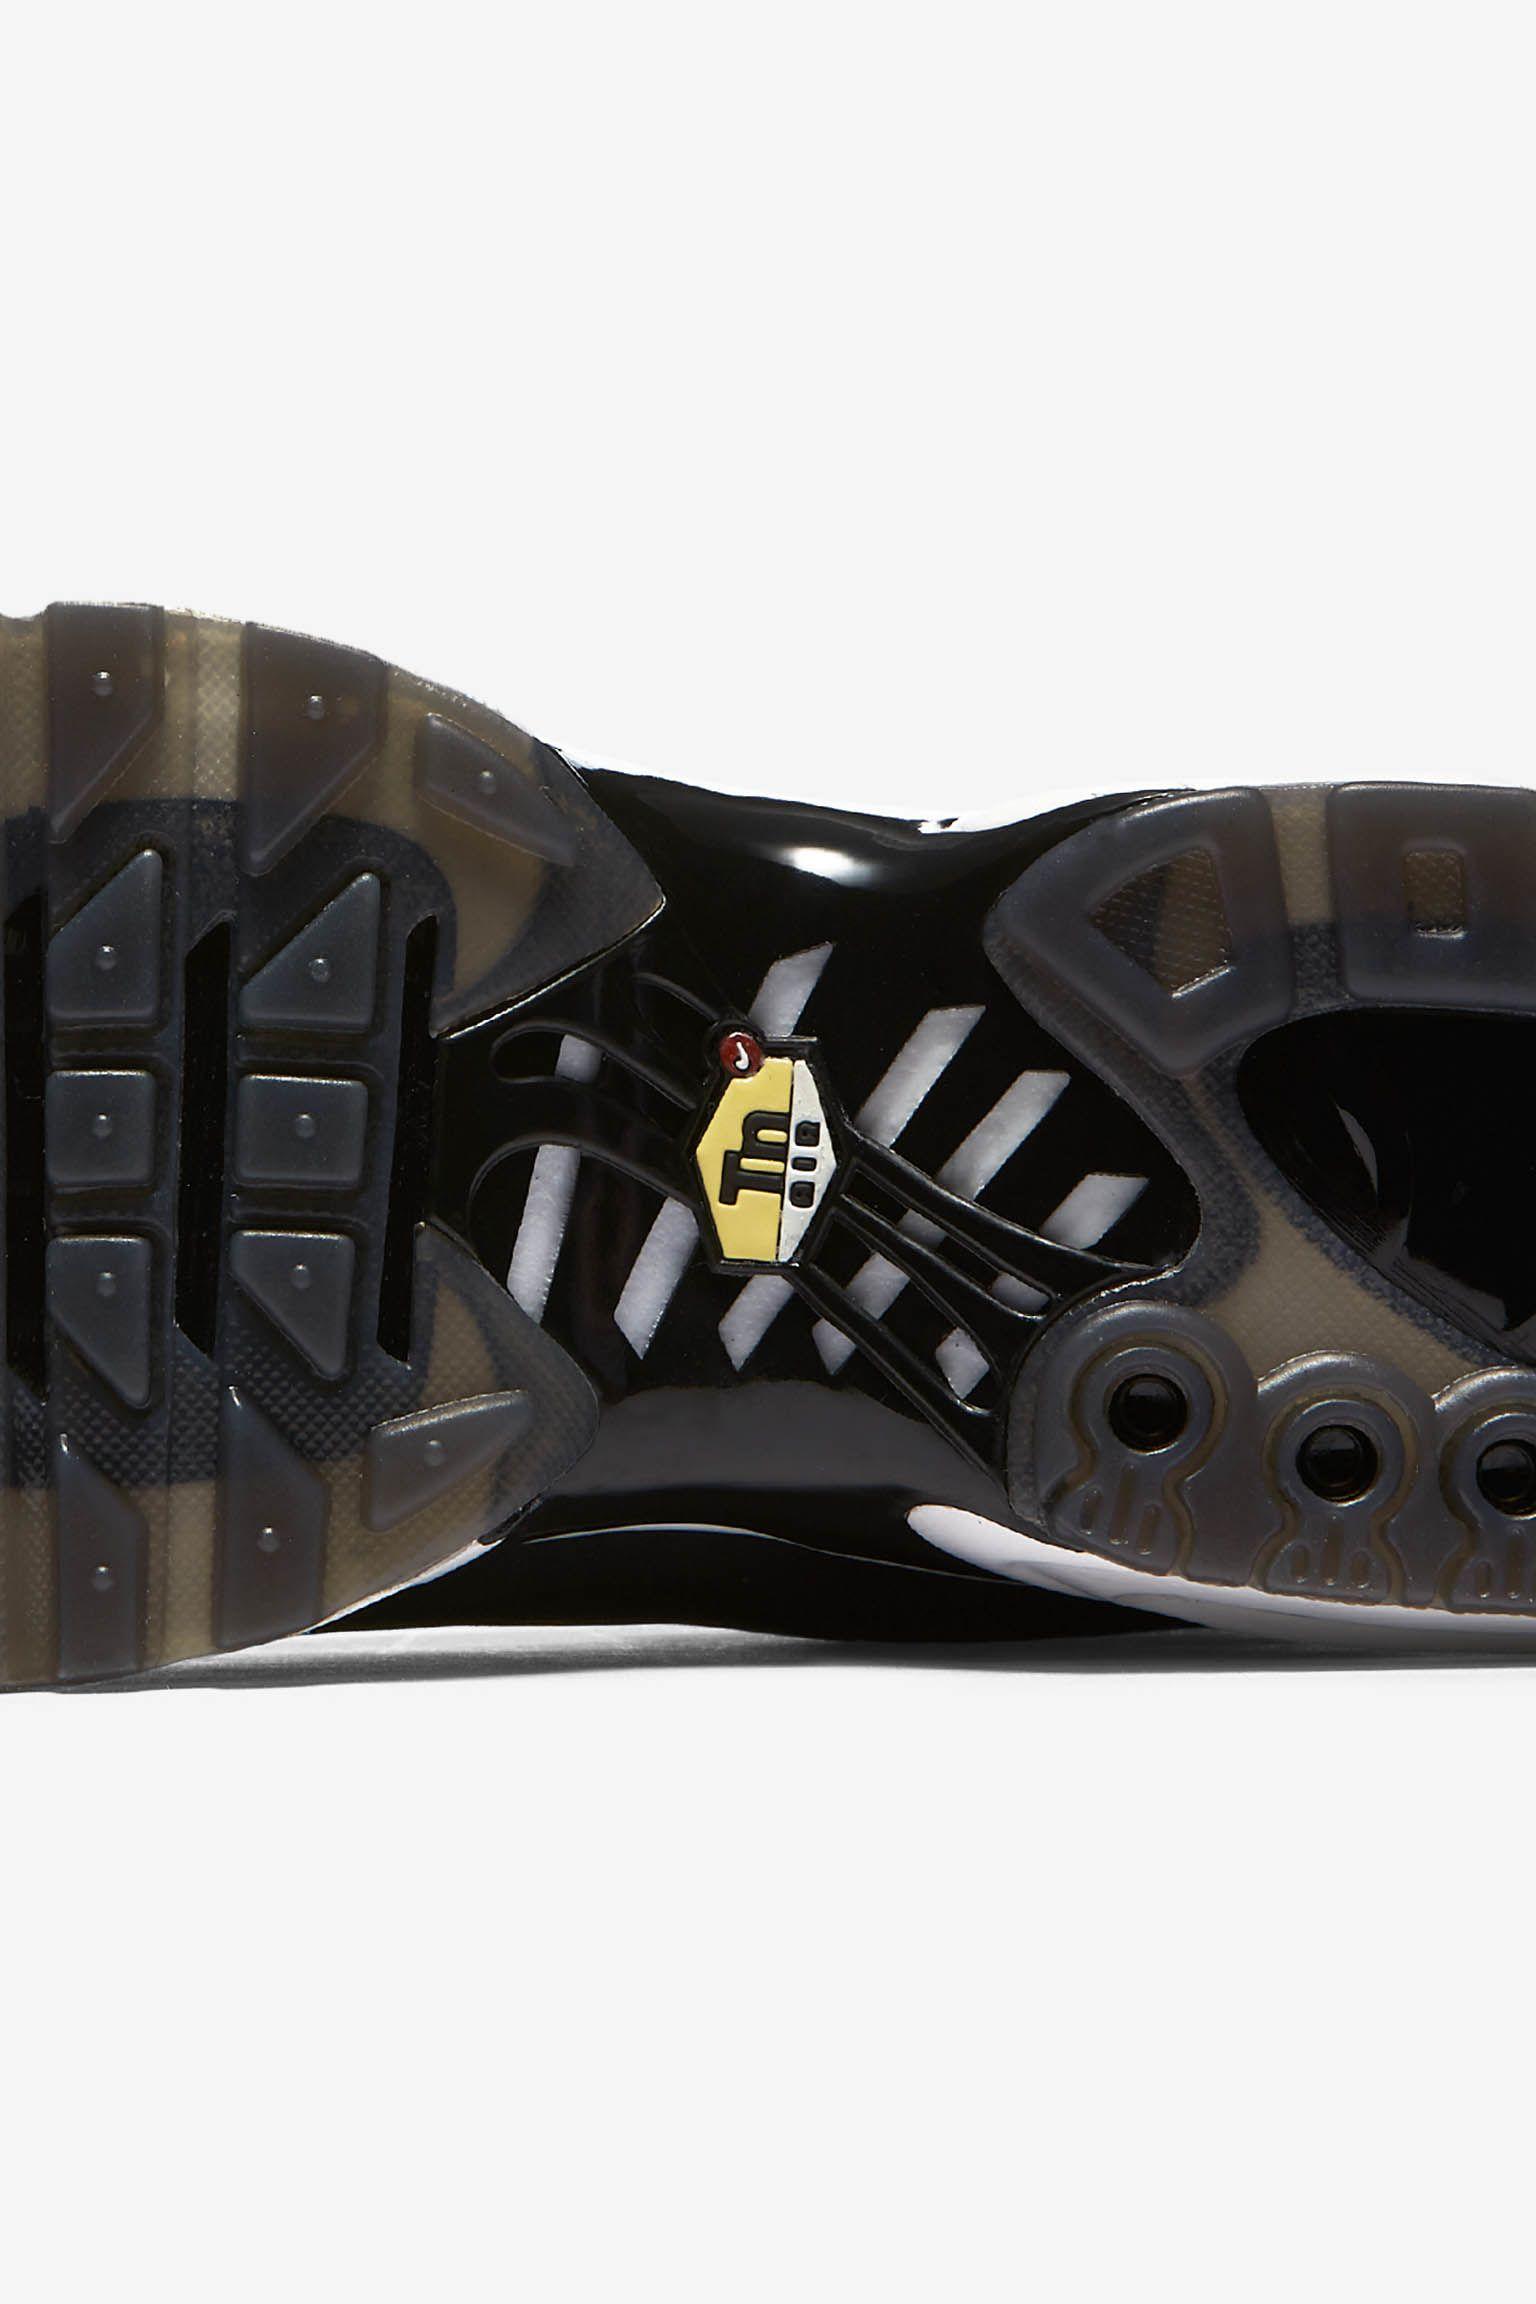 Nike Air Max Plus Big Logo 'Black & White' Release Date